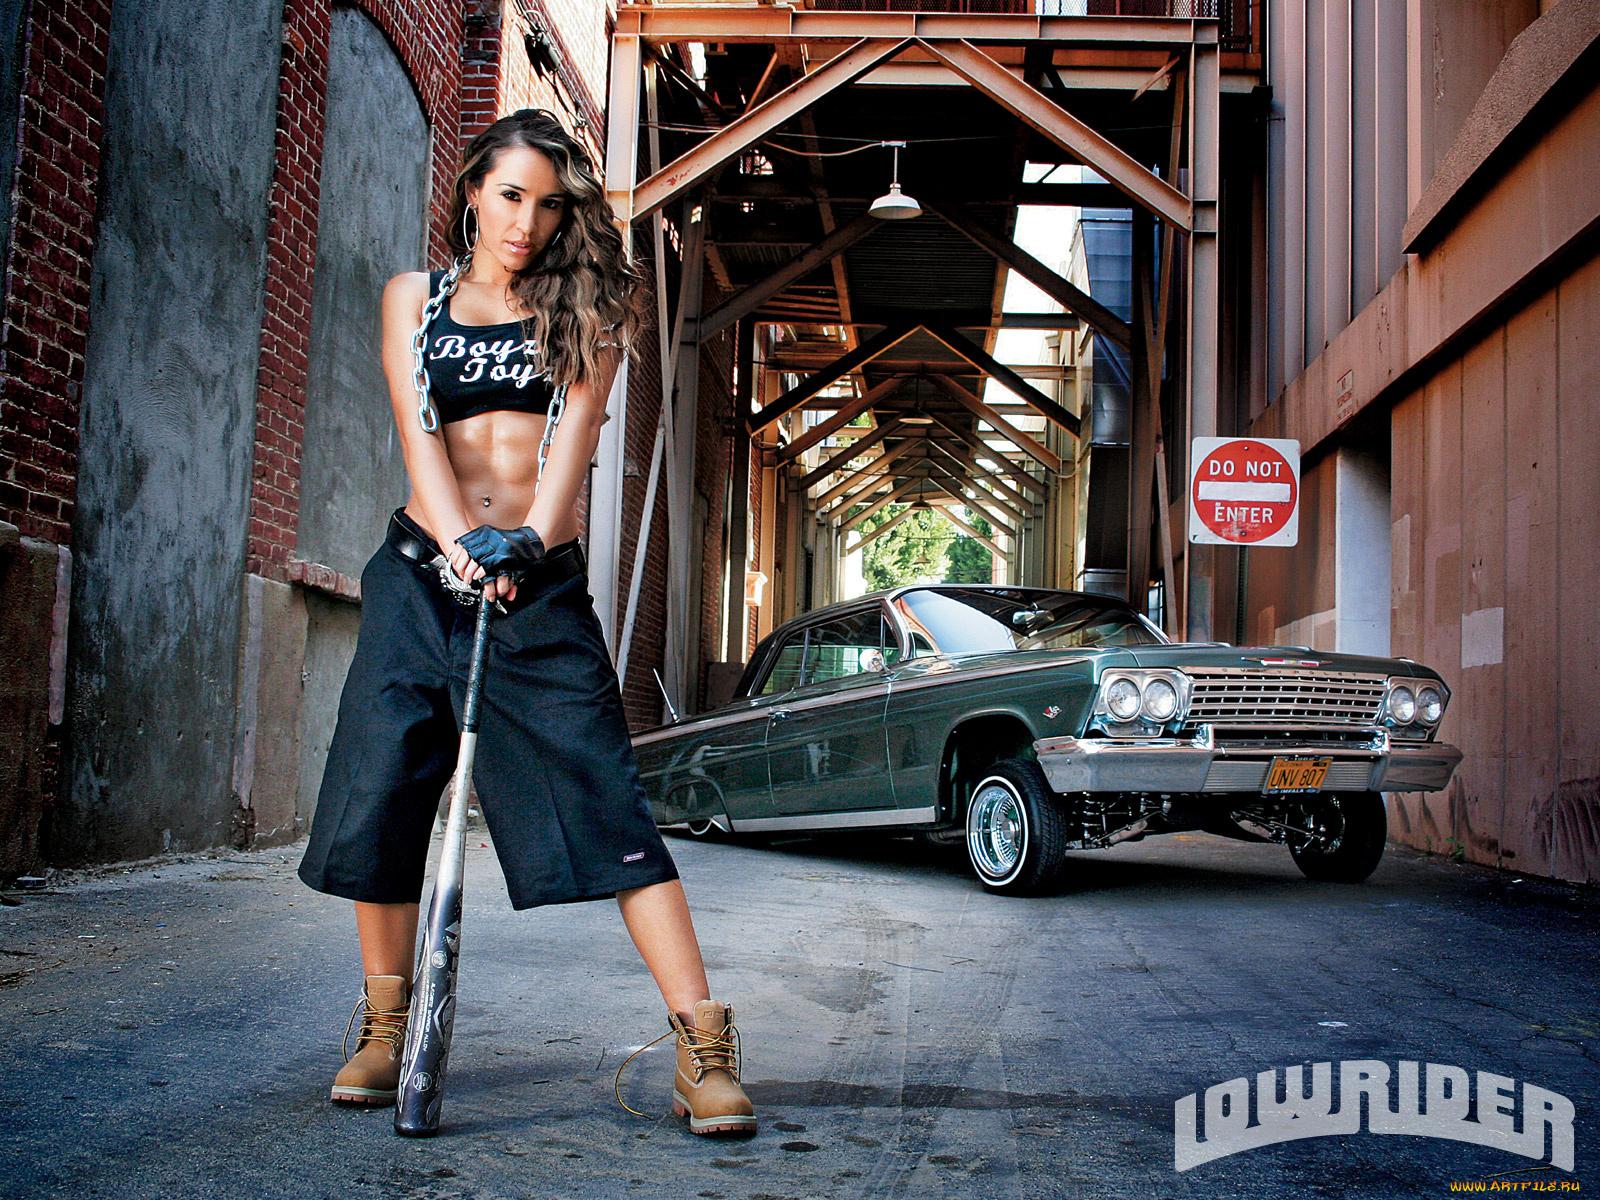 car Girl models lowrider show